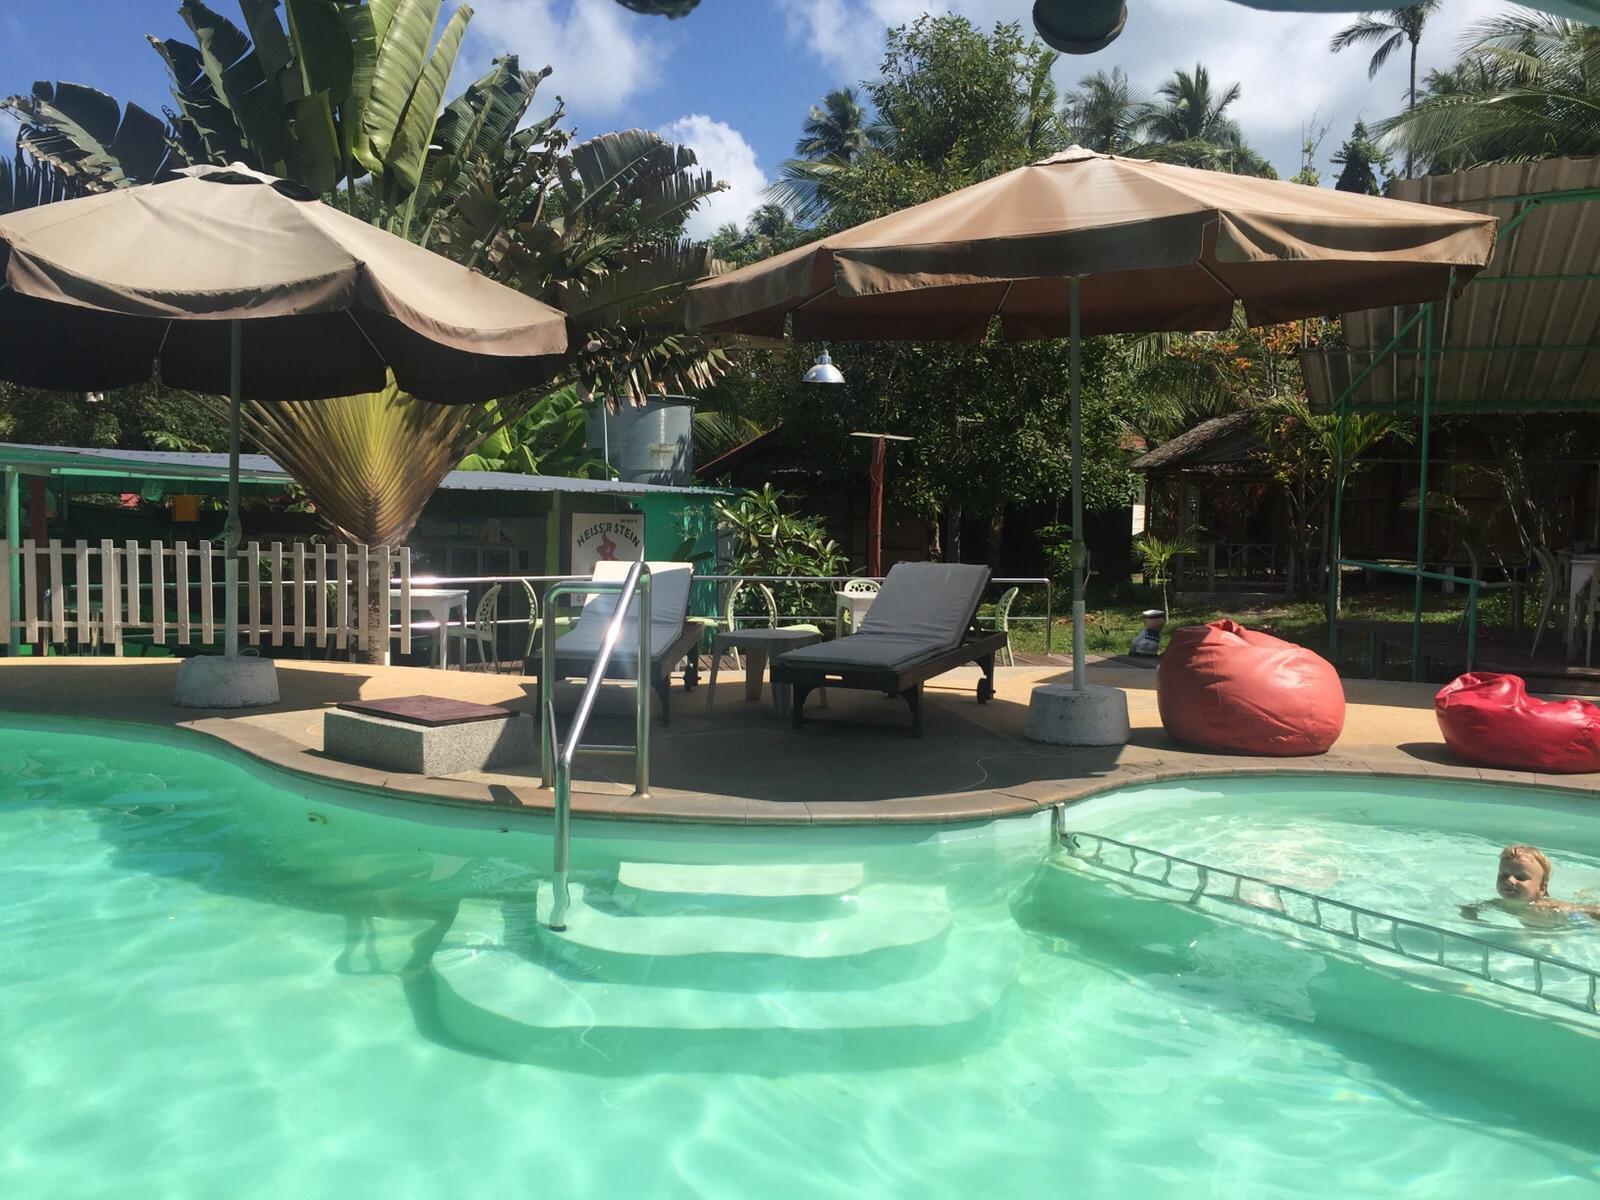 Bamboo Tropical Lounge Hotel แบมบู ทรอปิคัล เลาจน์ โฮเต็ล